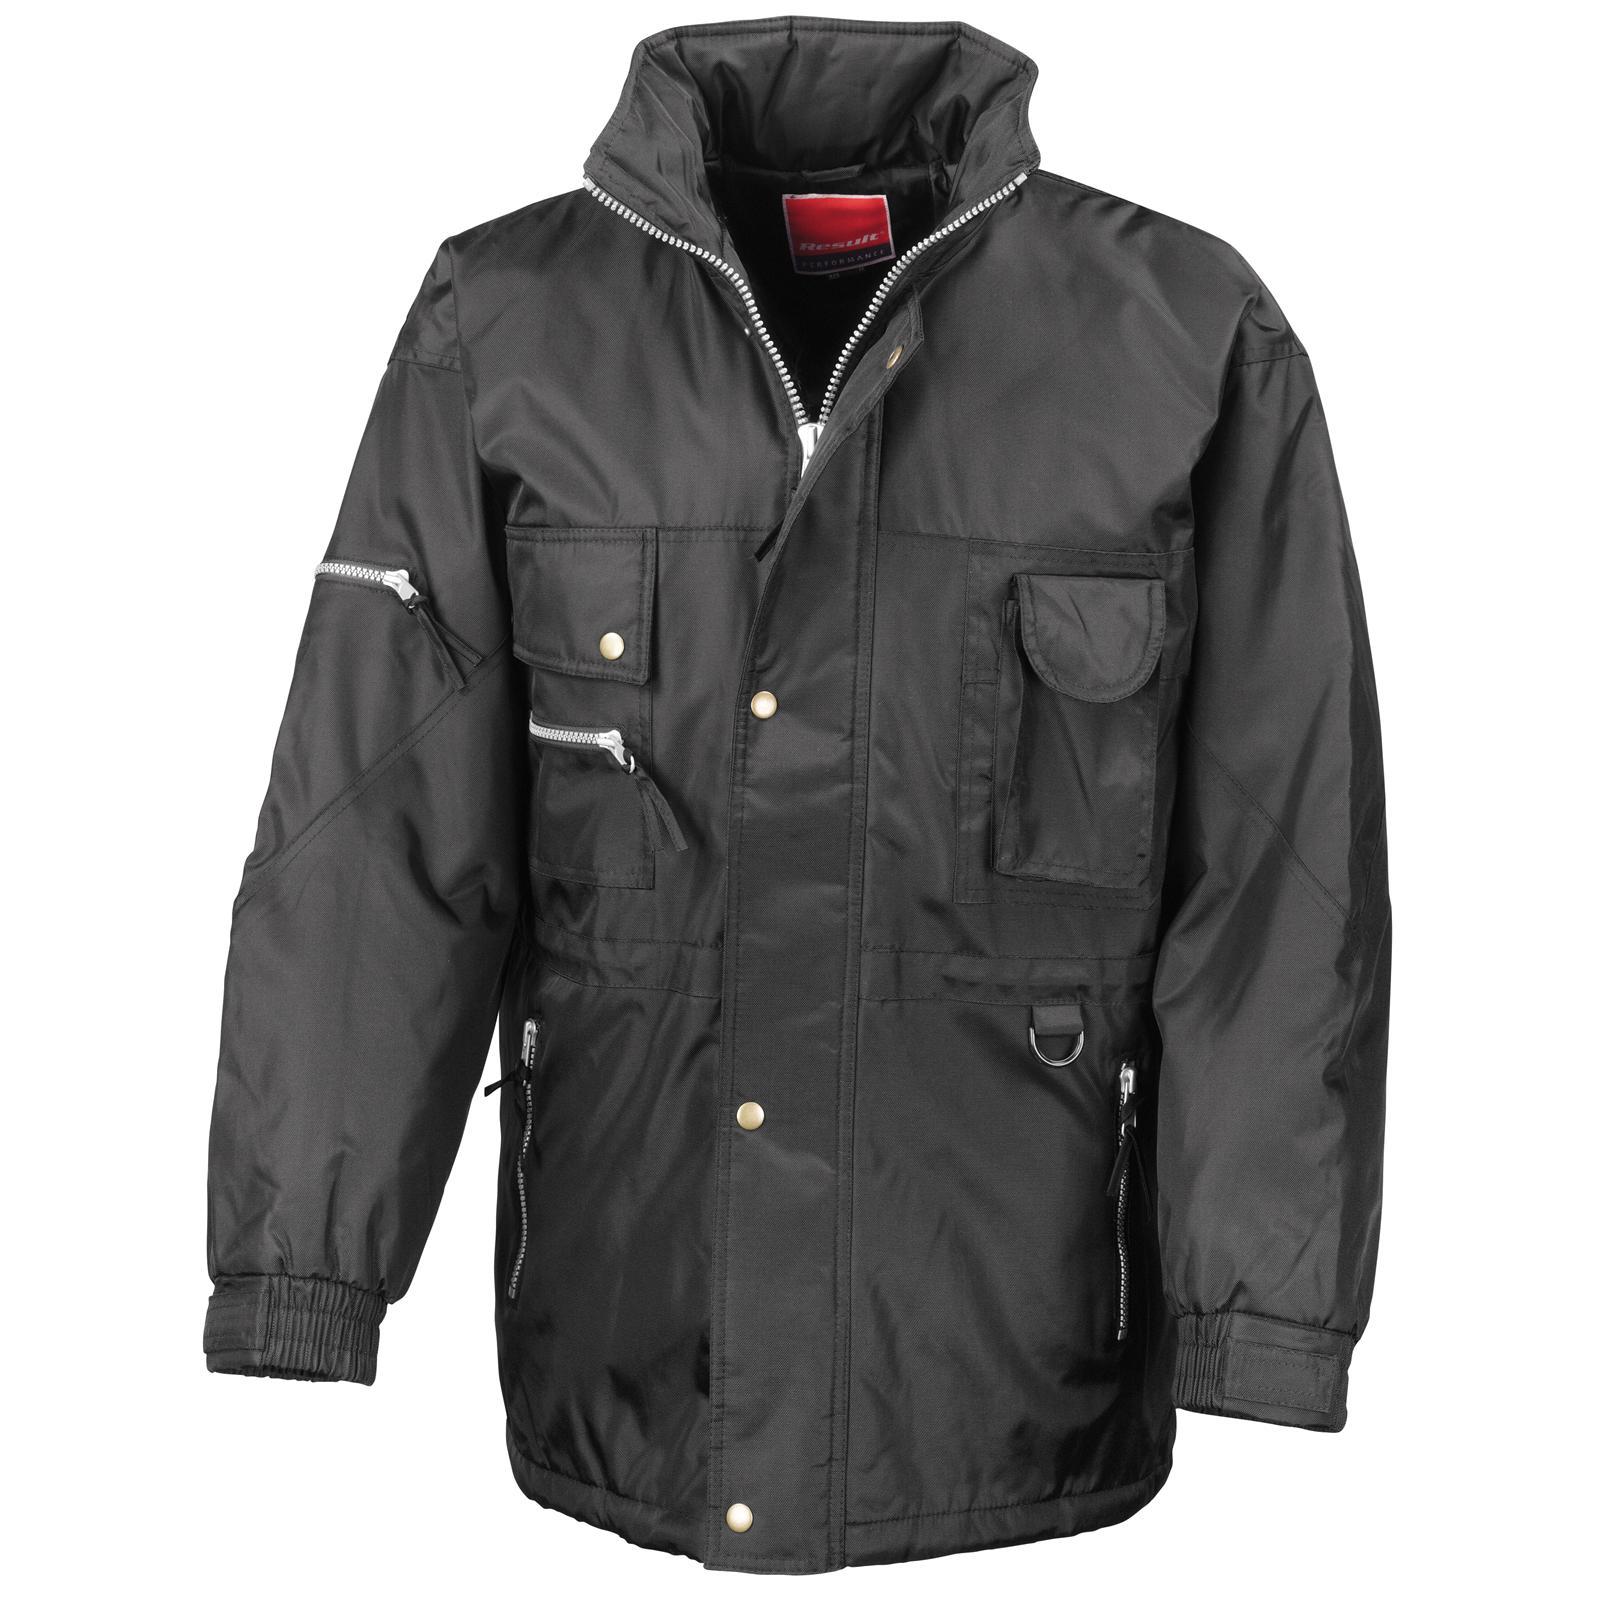 New RESULT Mens Winter Casual Hi Active Waterproof Jacket in 5 ...